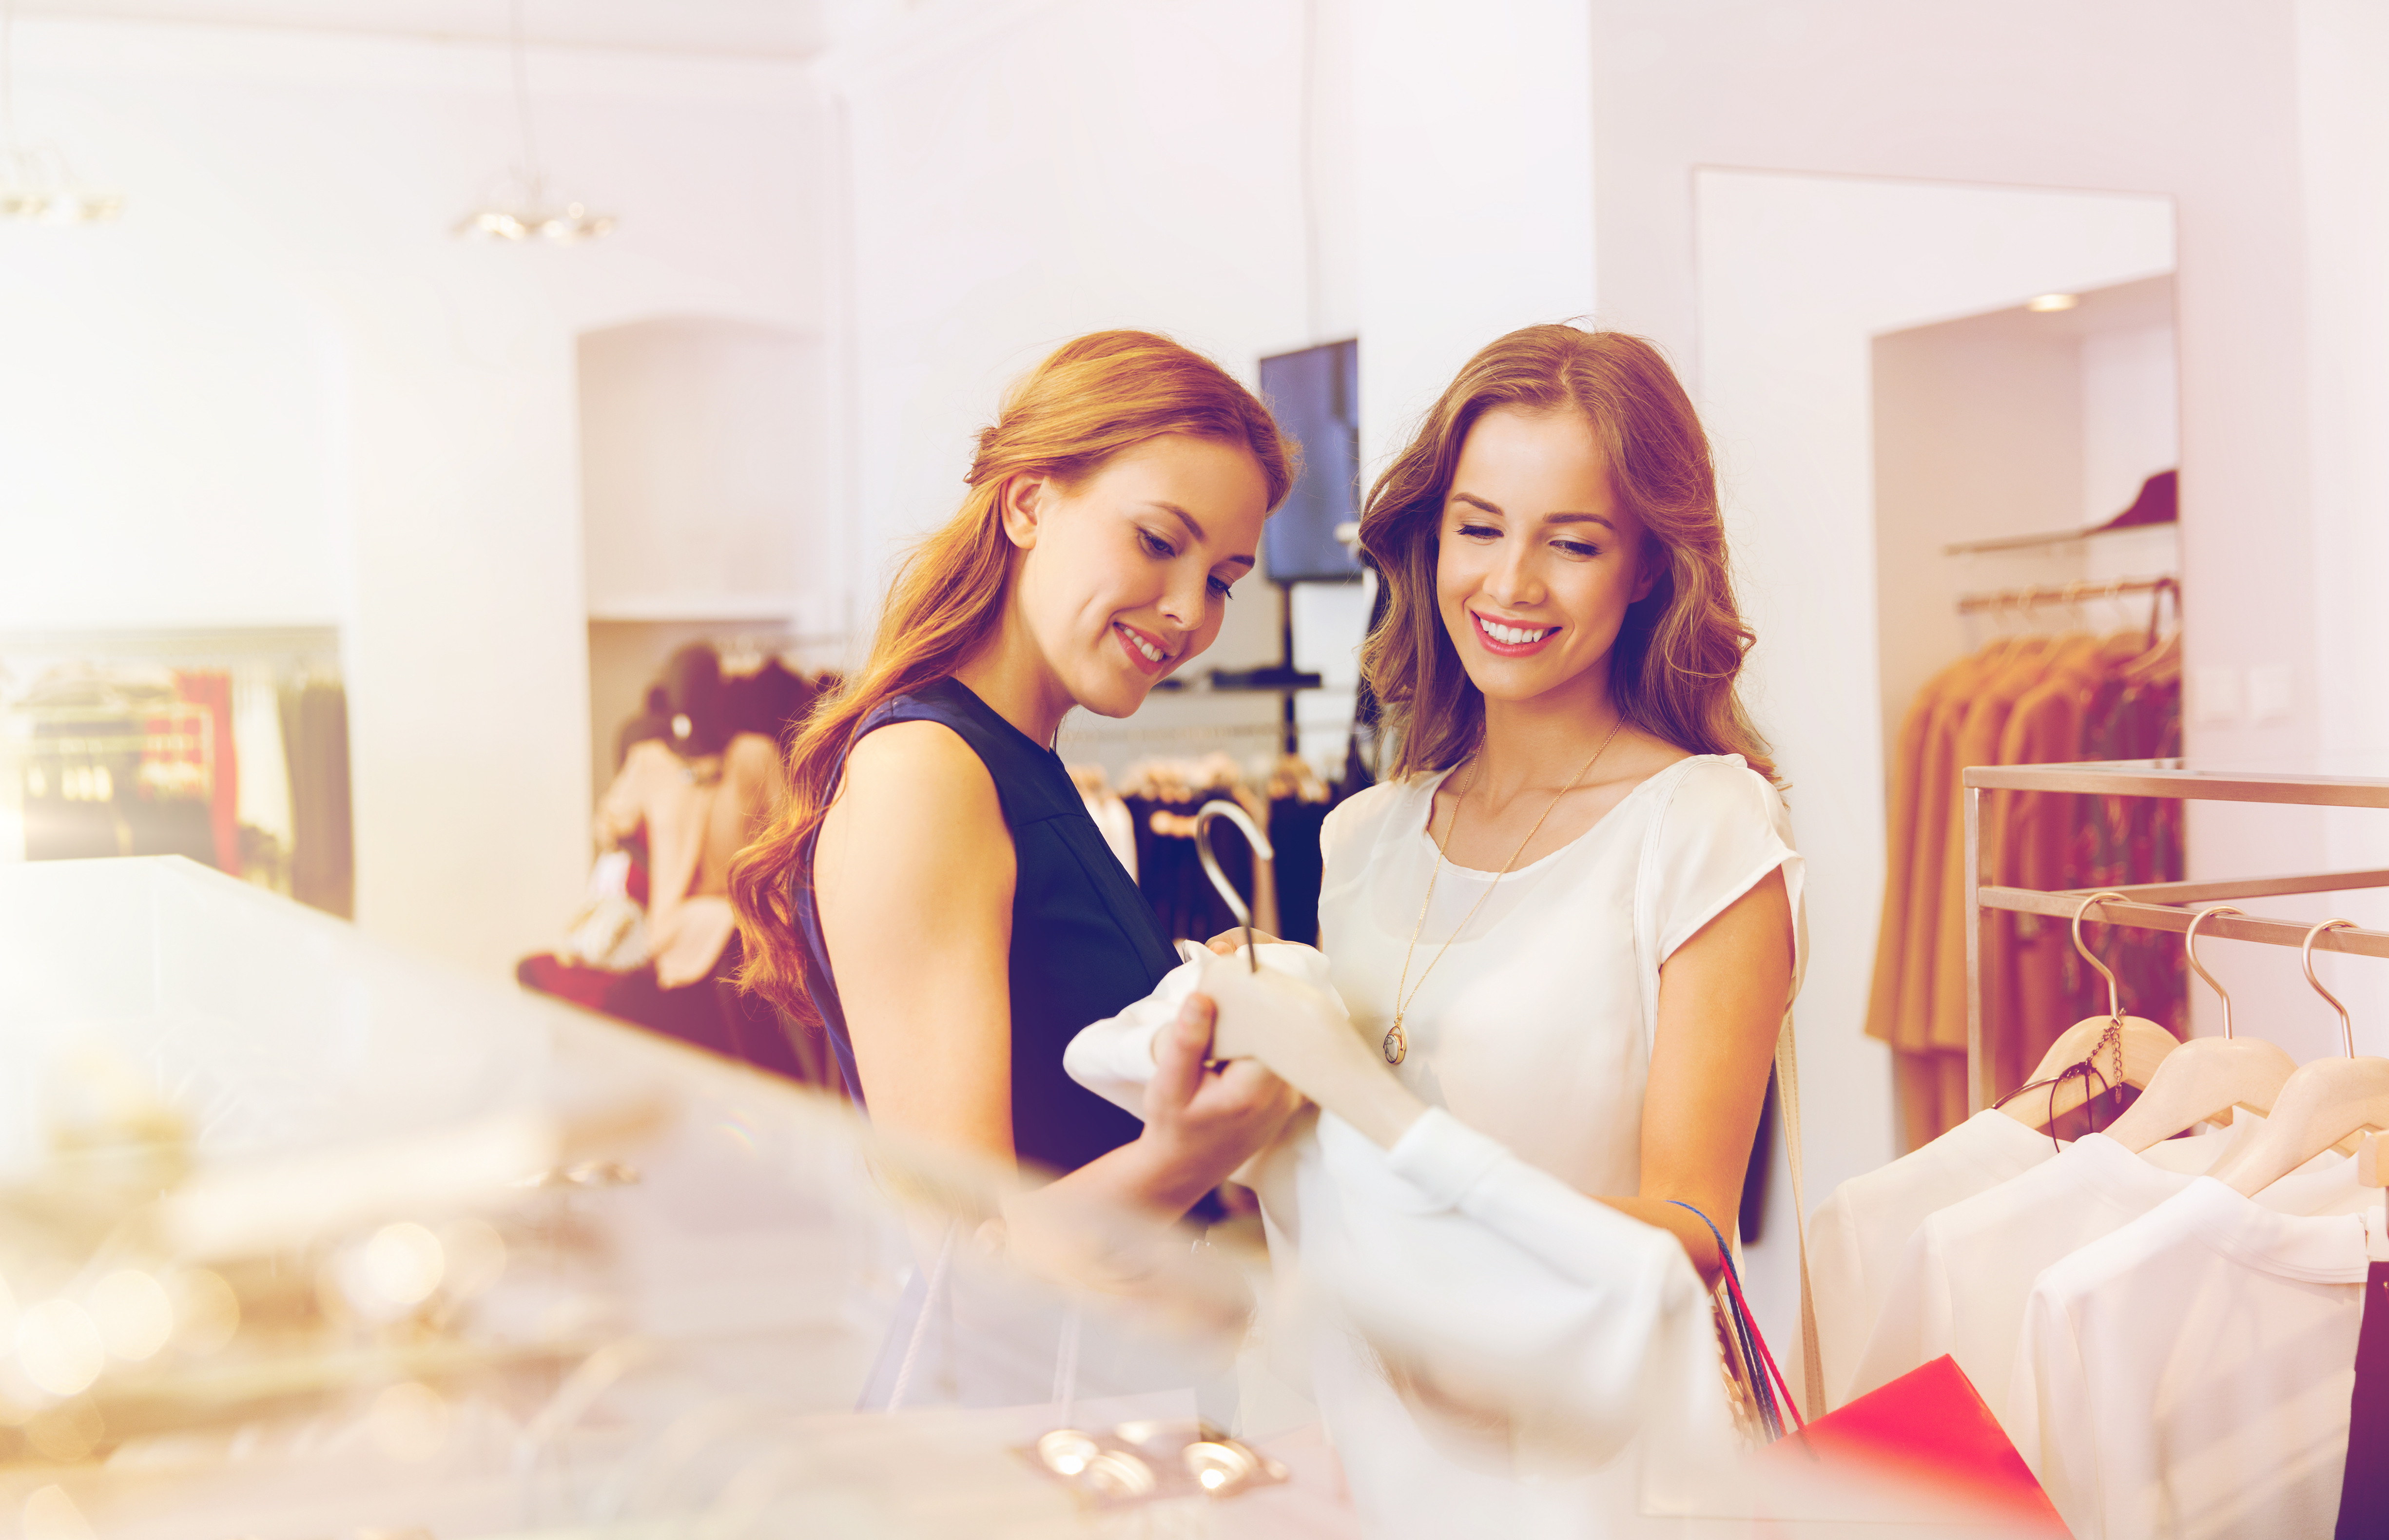 Art of shopping